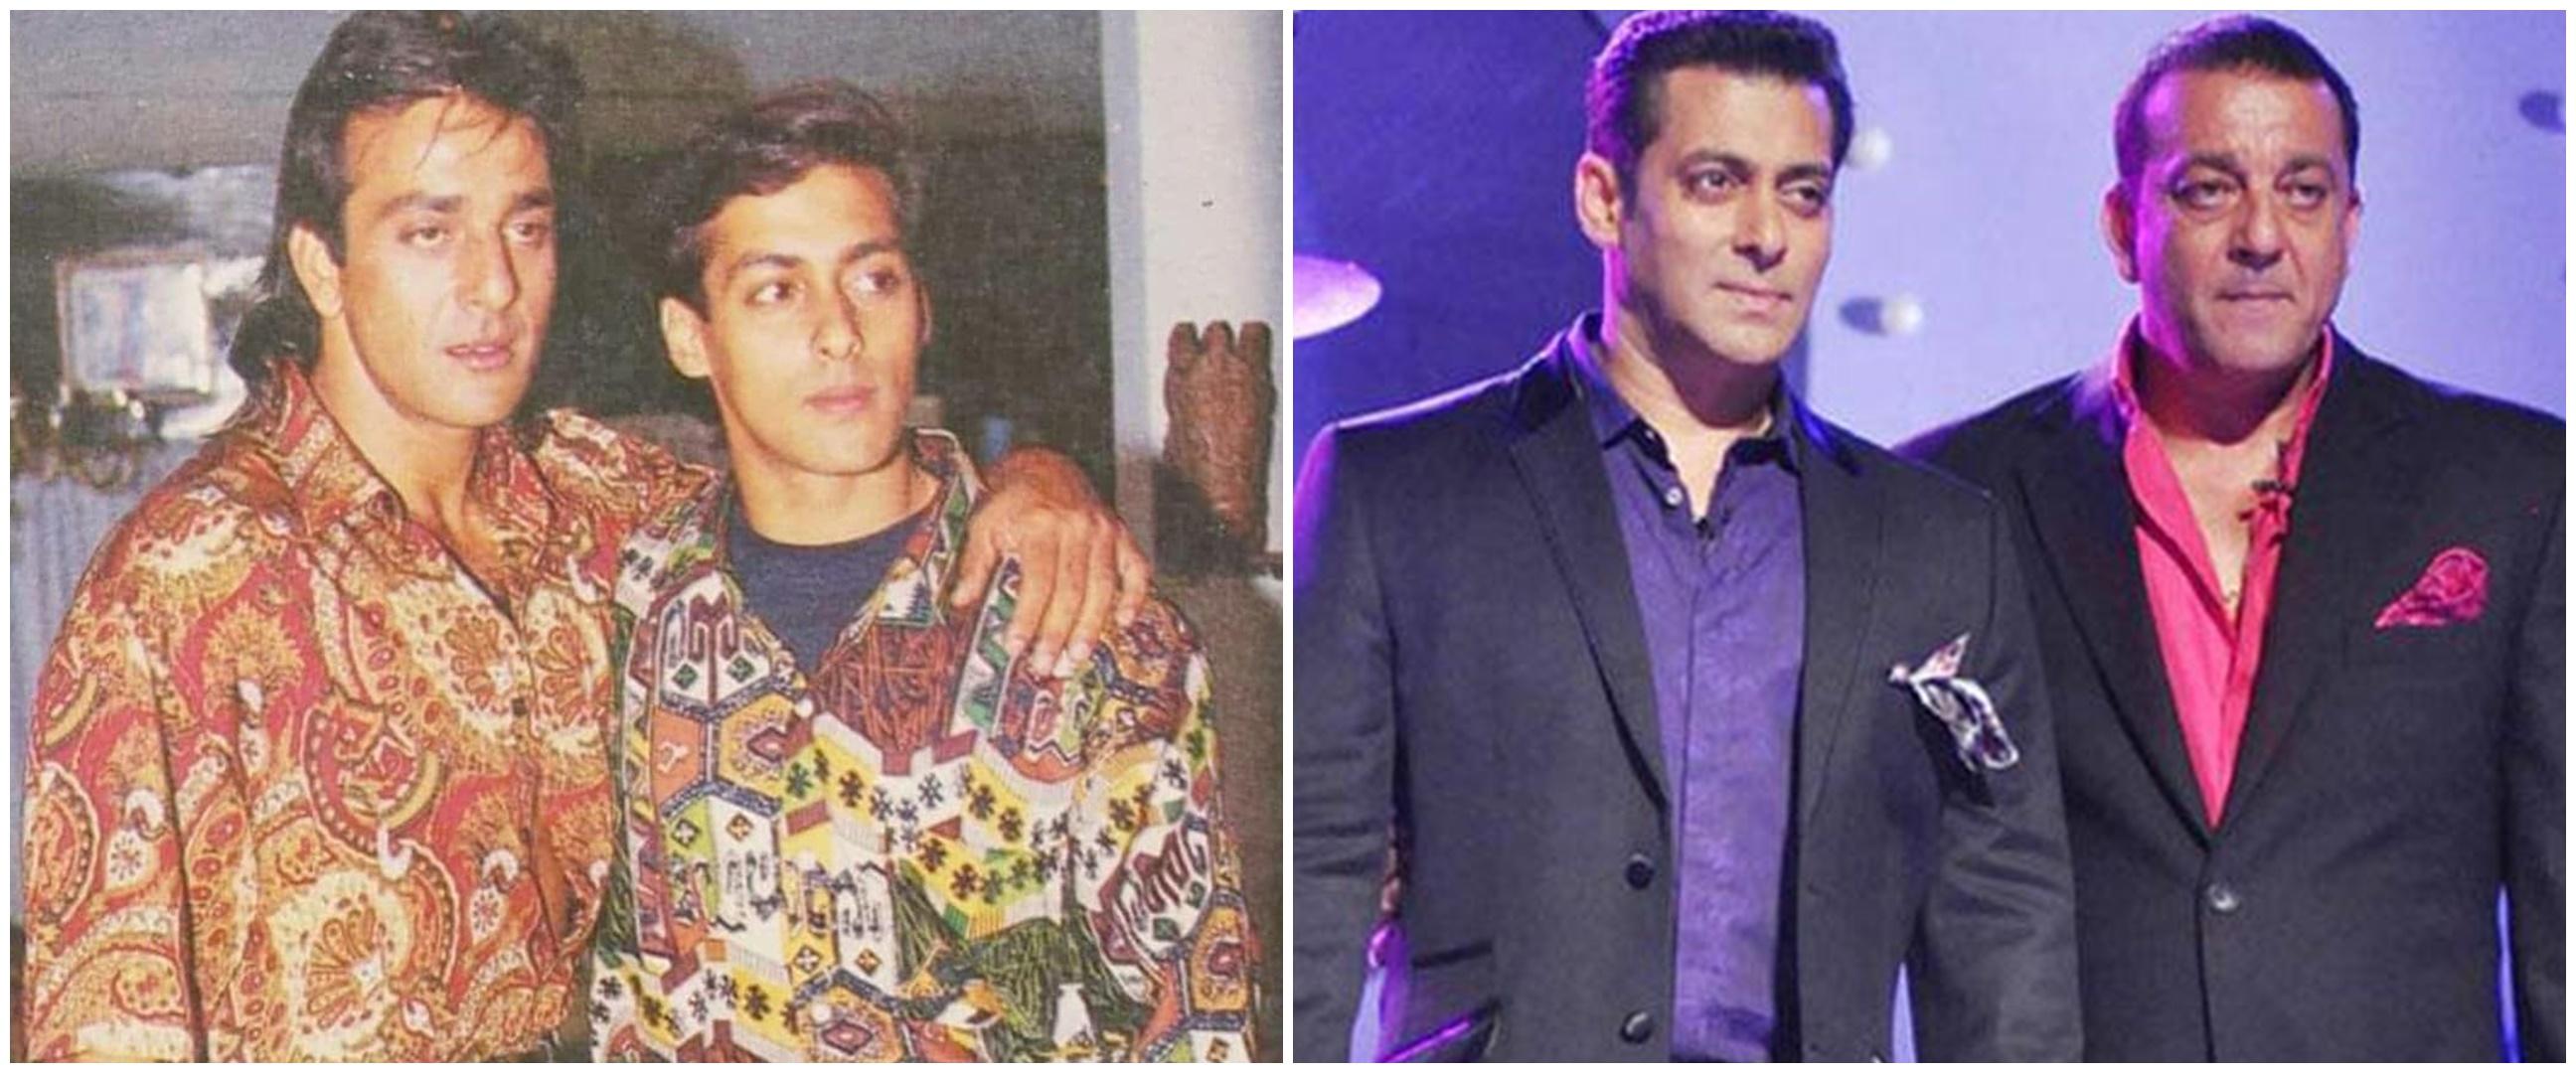 8 Potret persahabatan Salman Khan dan Sanjay Dutt, bak kakak-adik